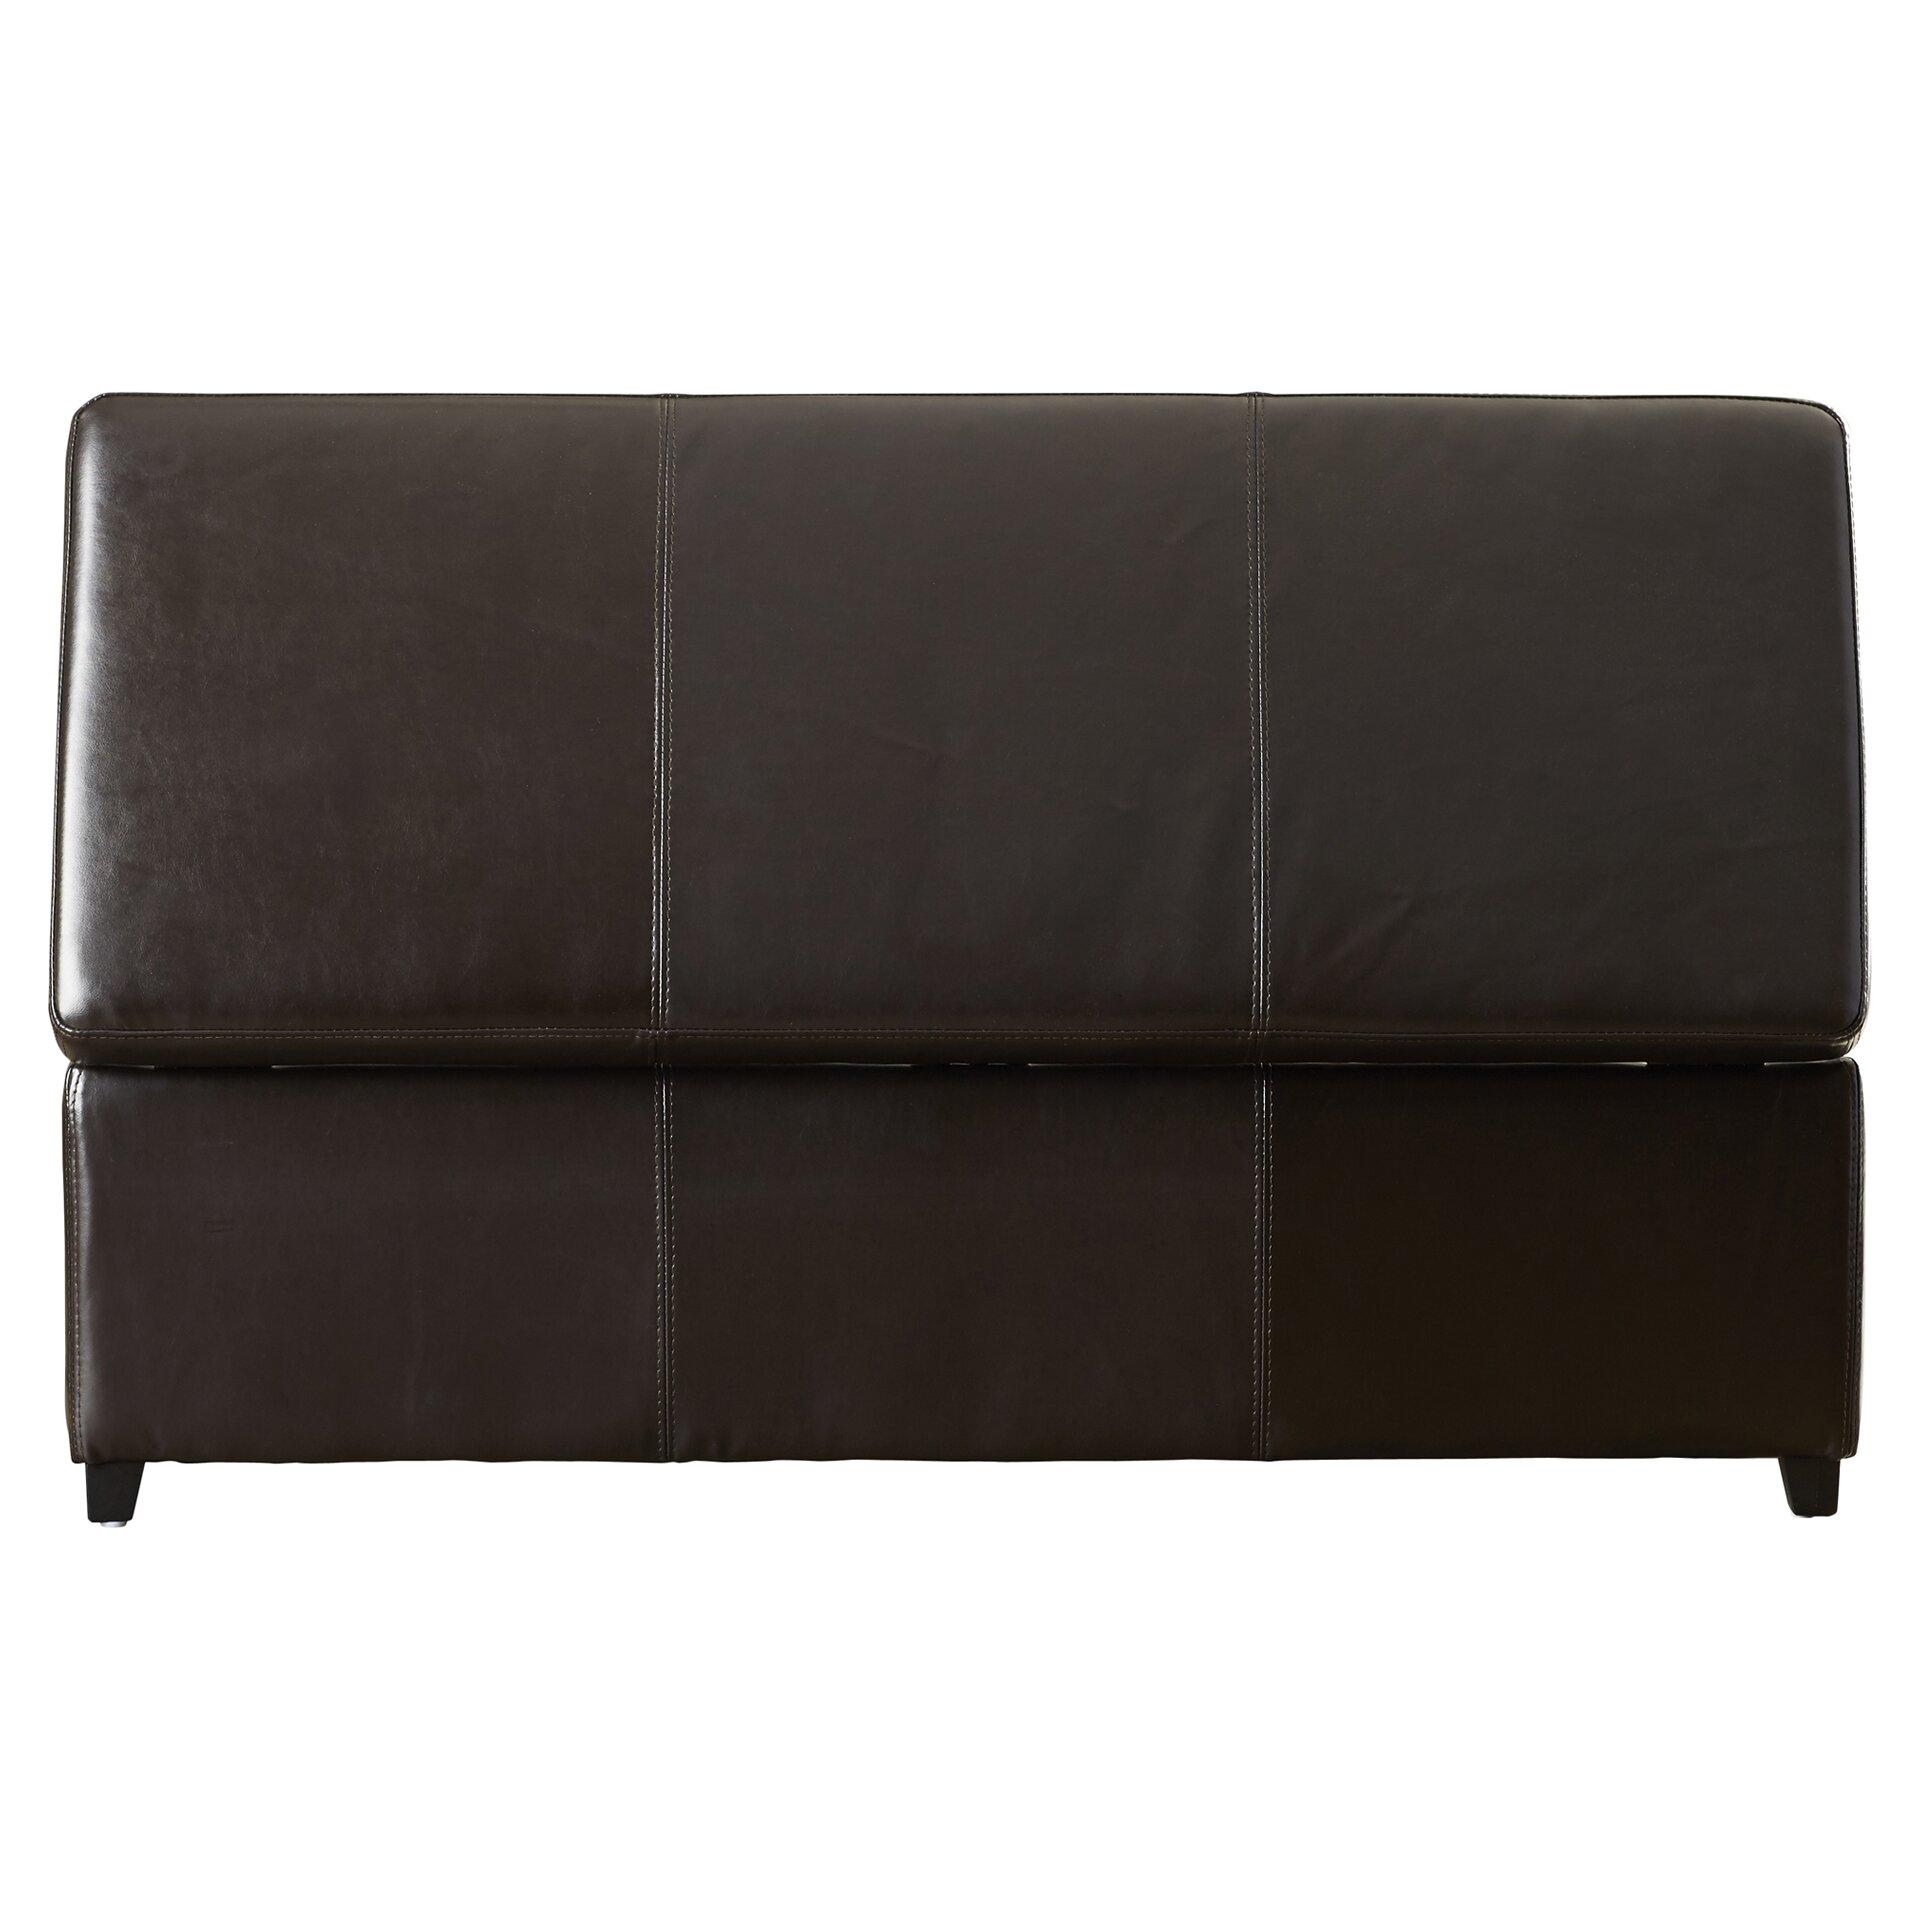 Charlton Home Ephraim Leather Storage Ottoman Bench